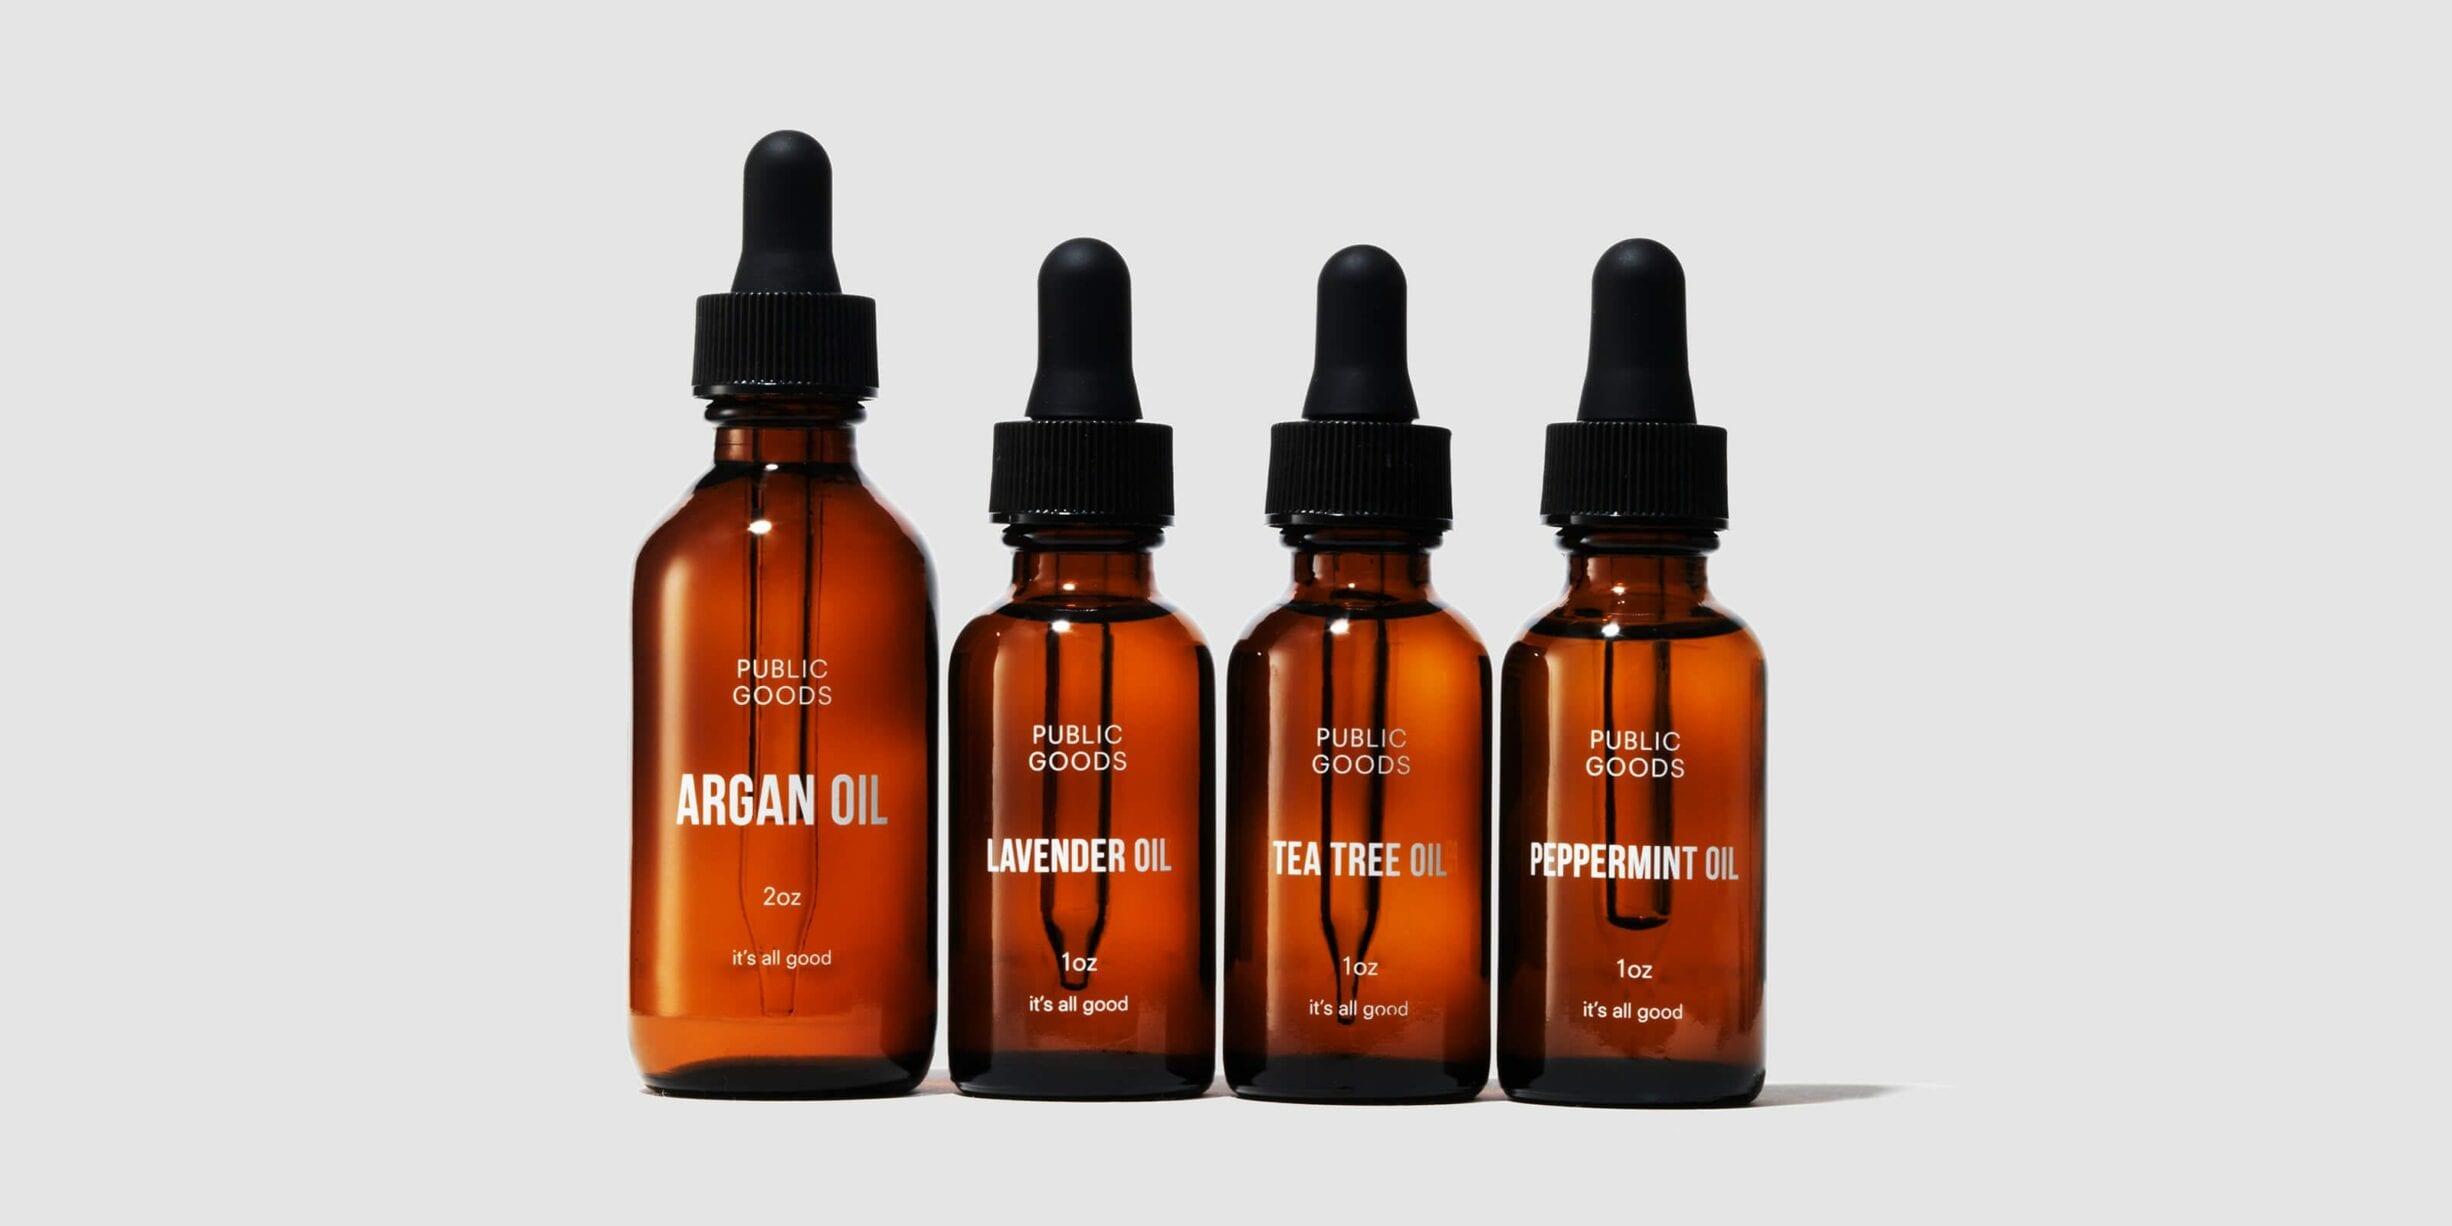 public goods essential oil bottles, droppers